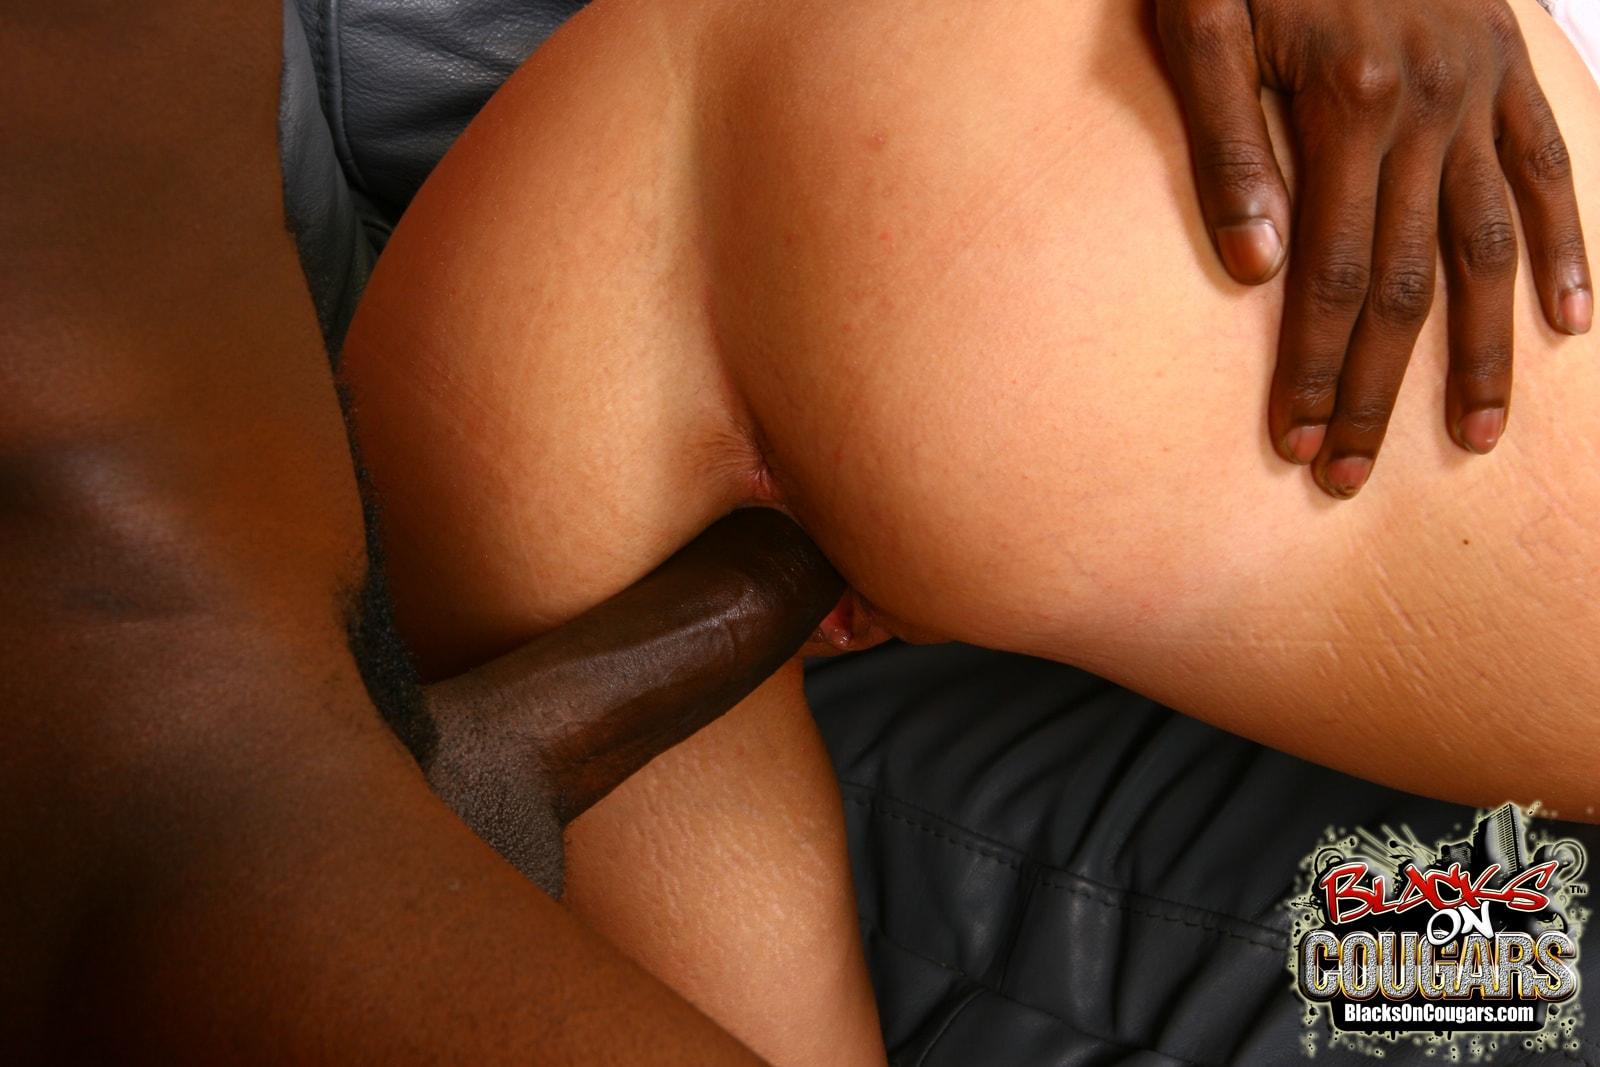 Dogfart '- Blacks On Cougars' starring Kylie Worthy (Photo 18)